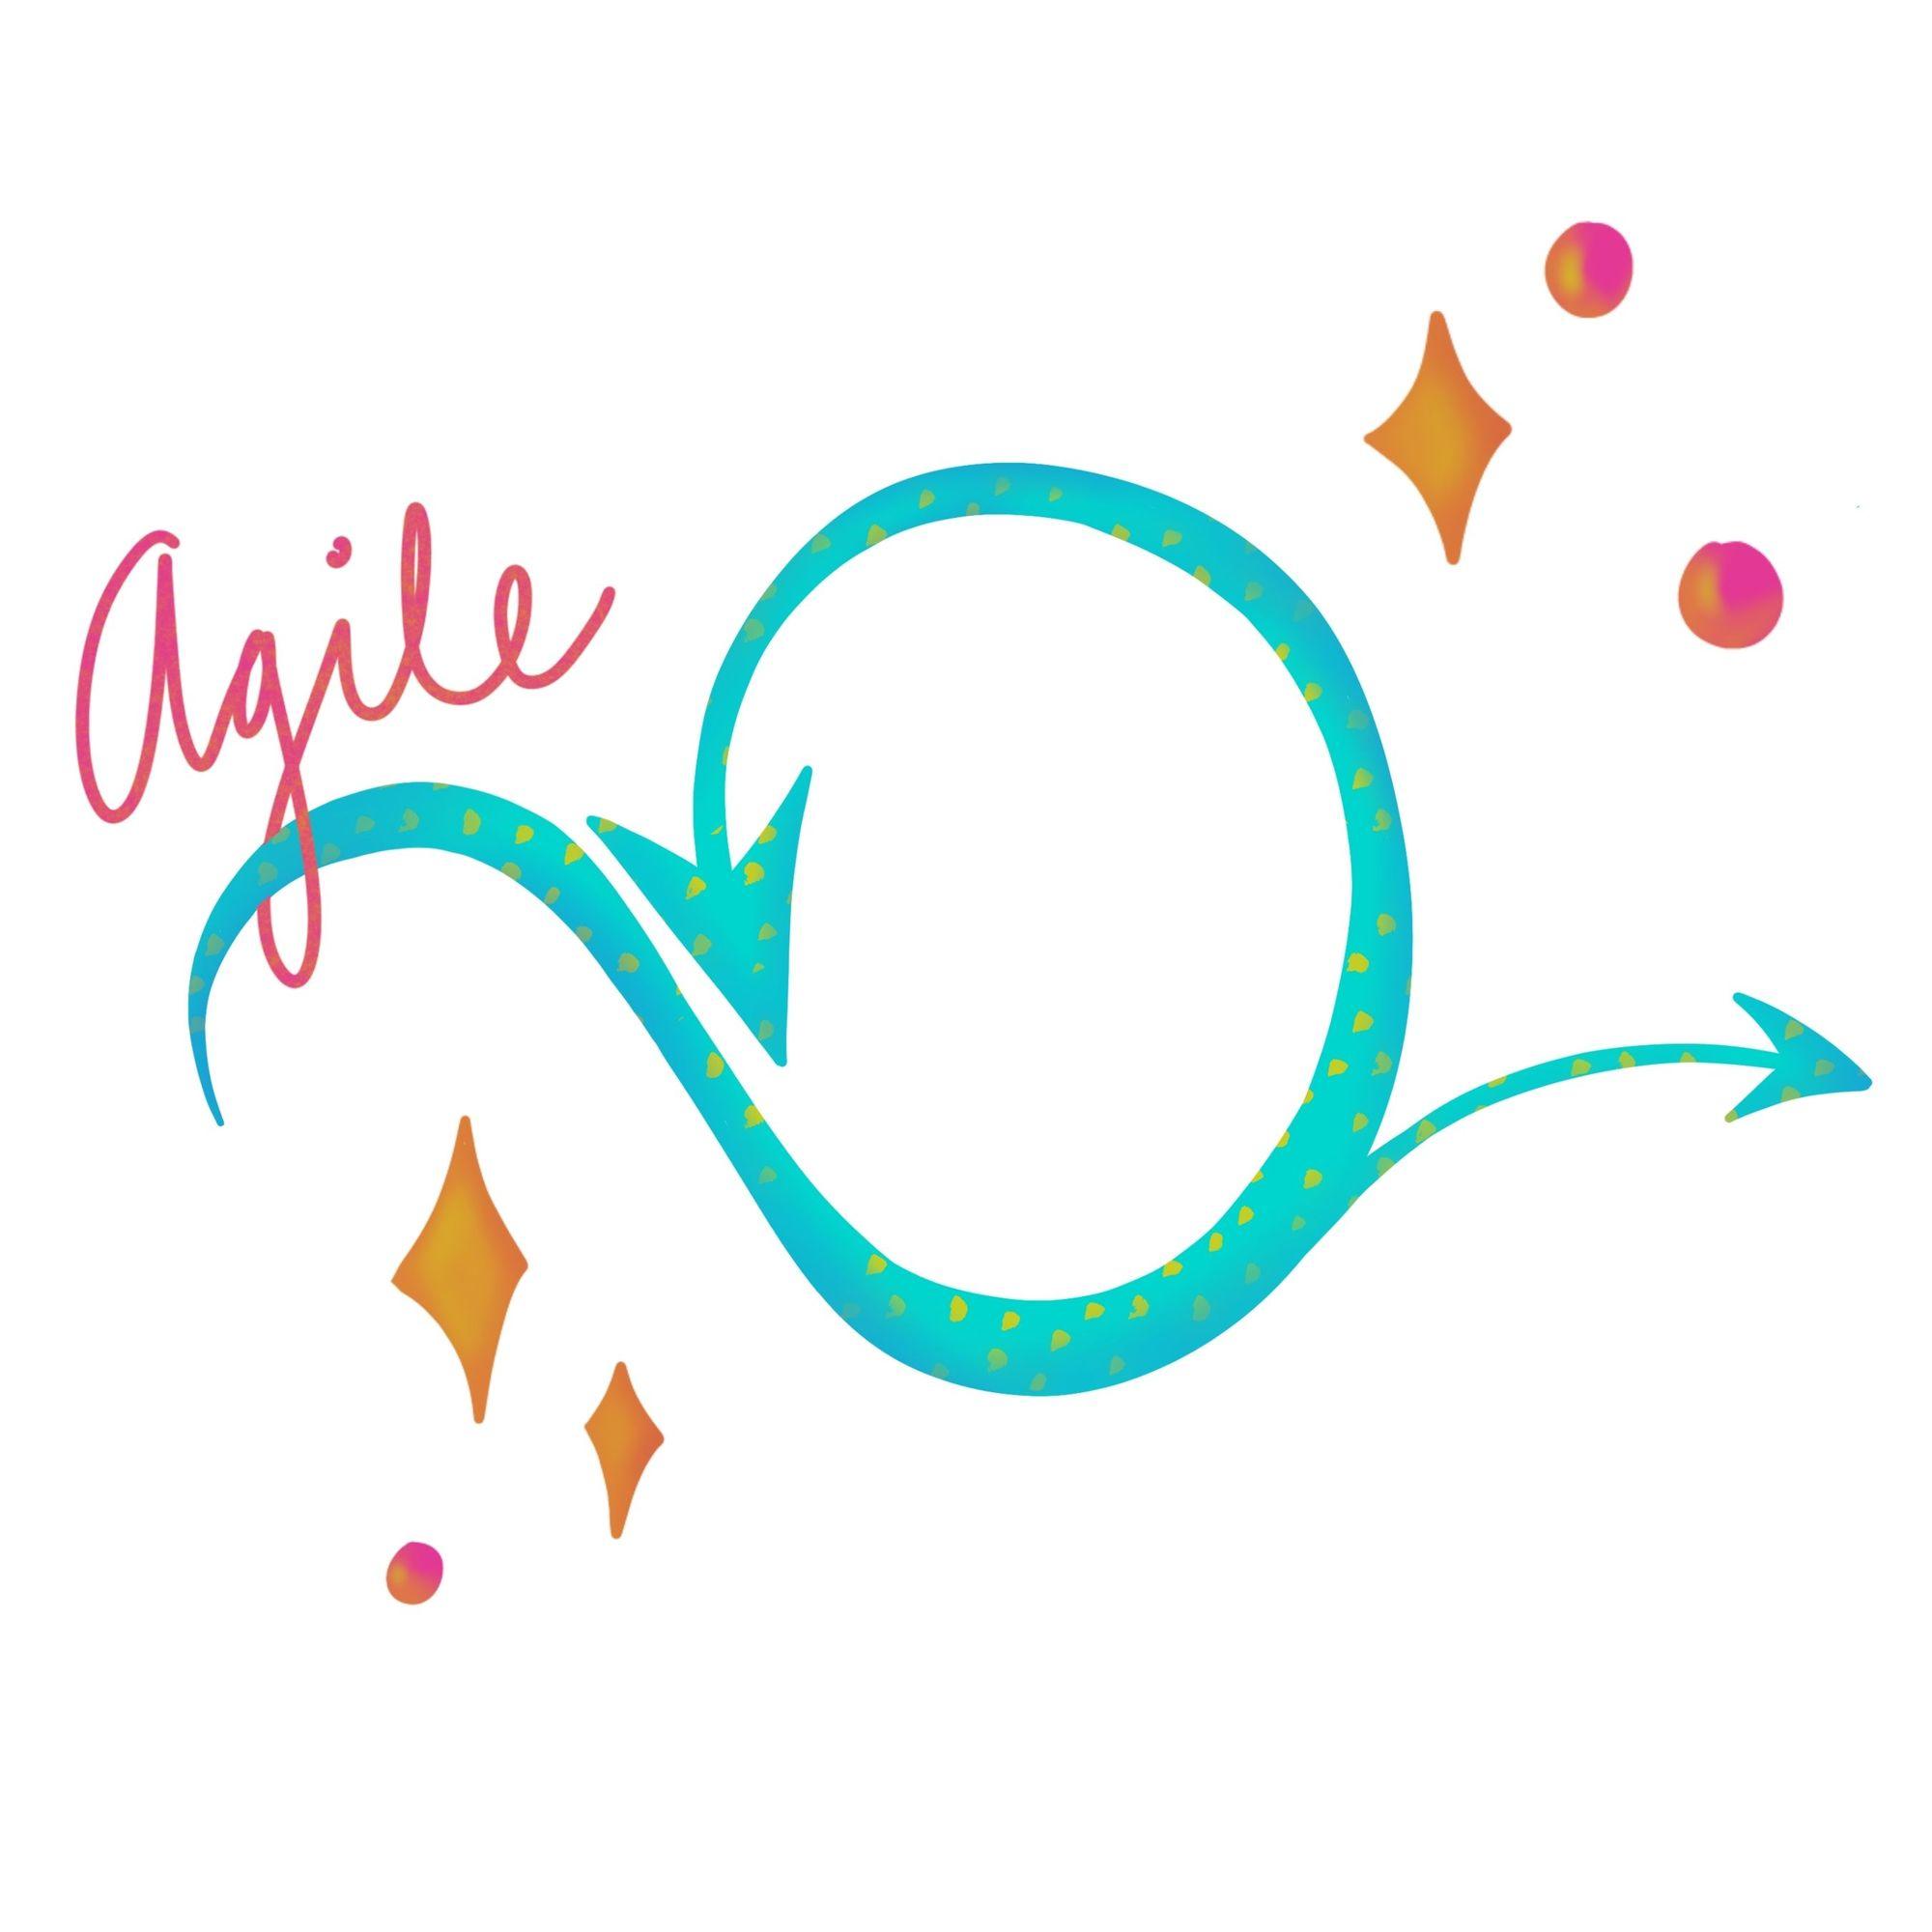 Jexo Agile logo for Jira